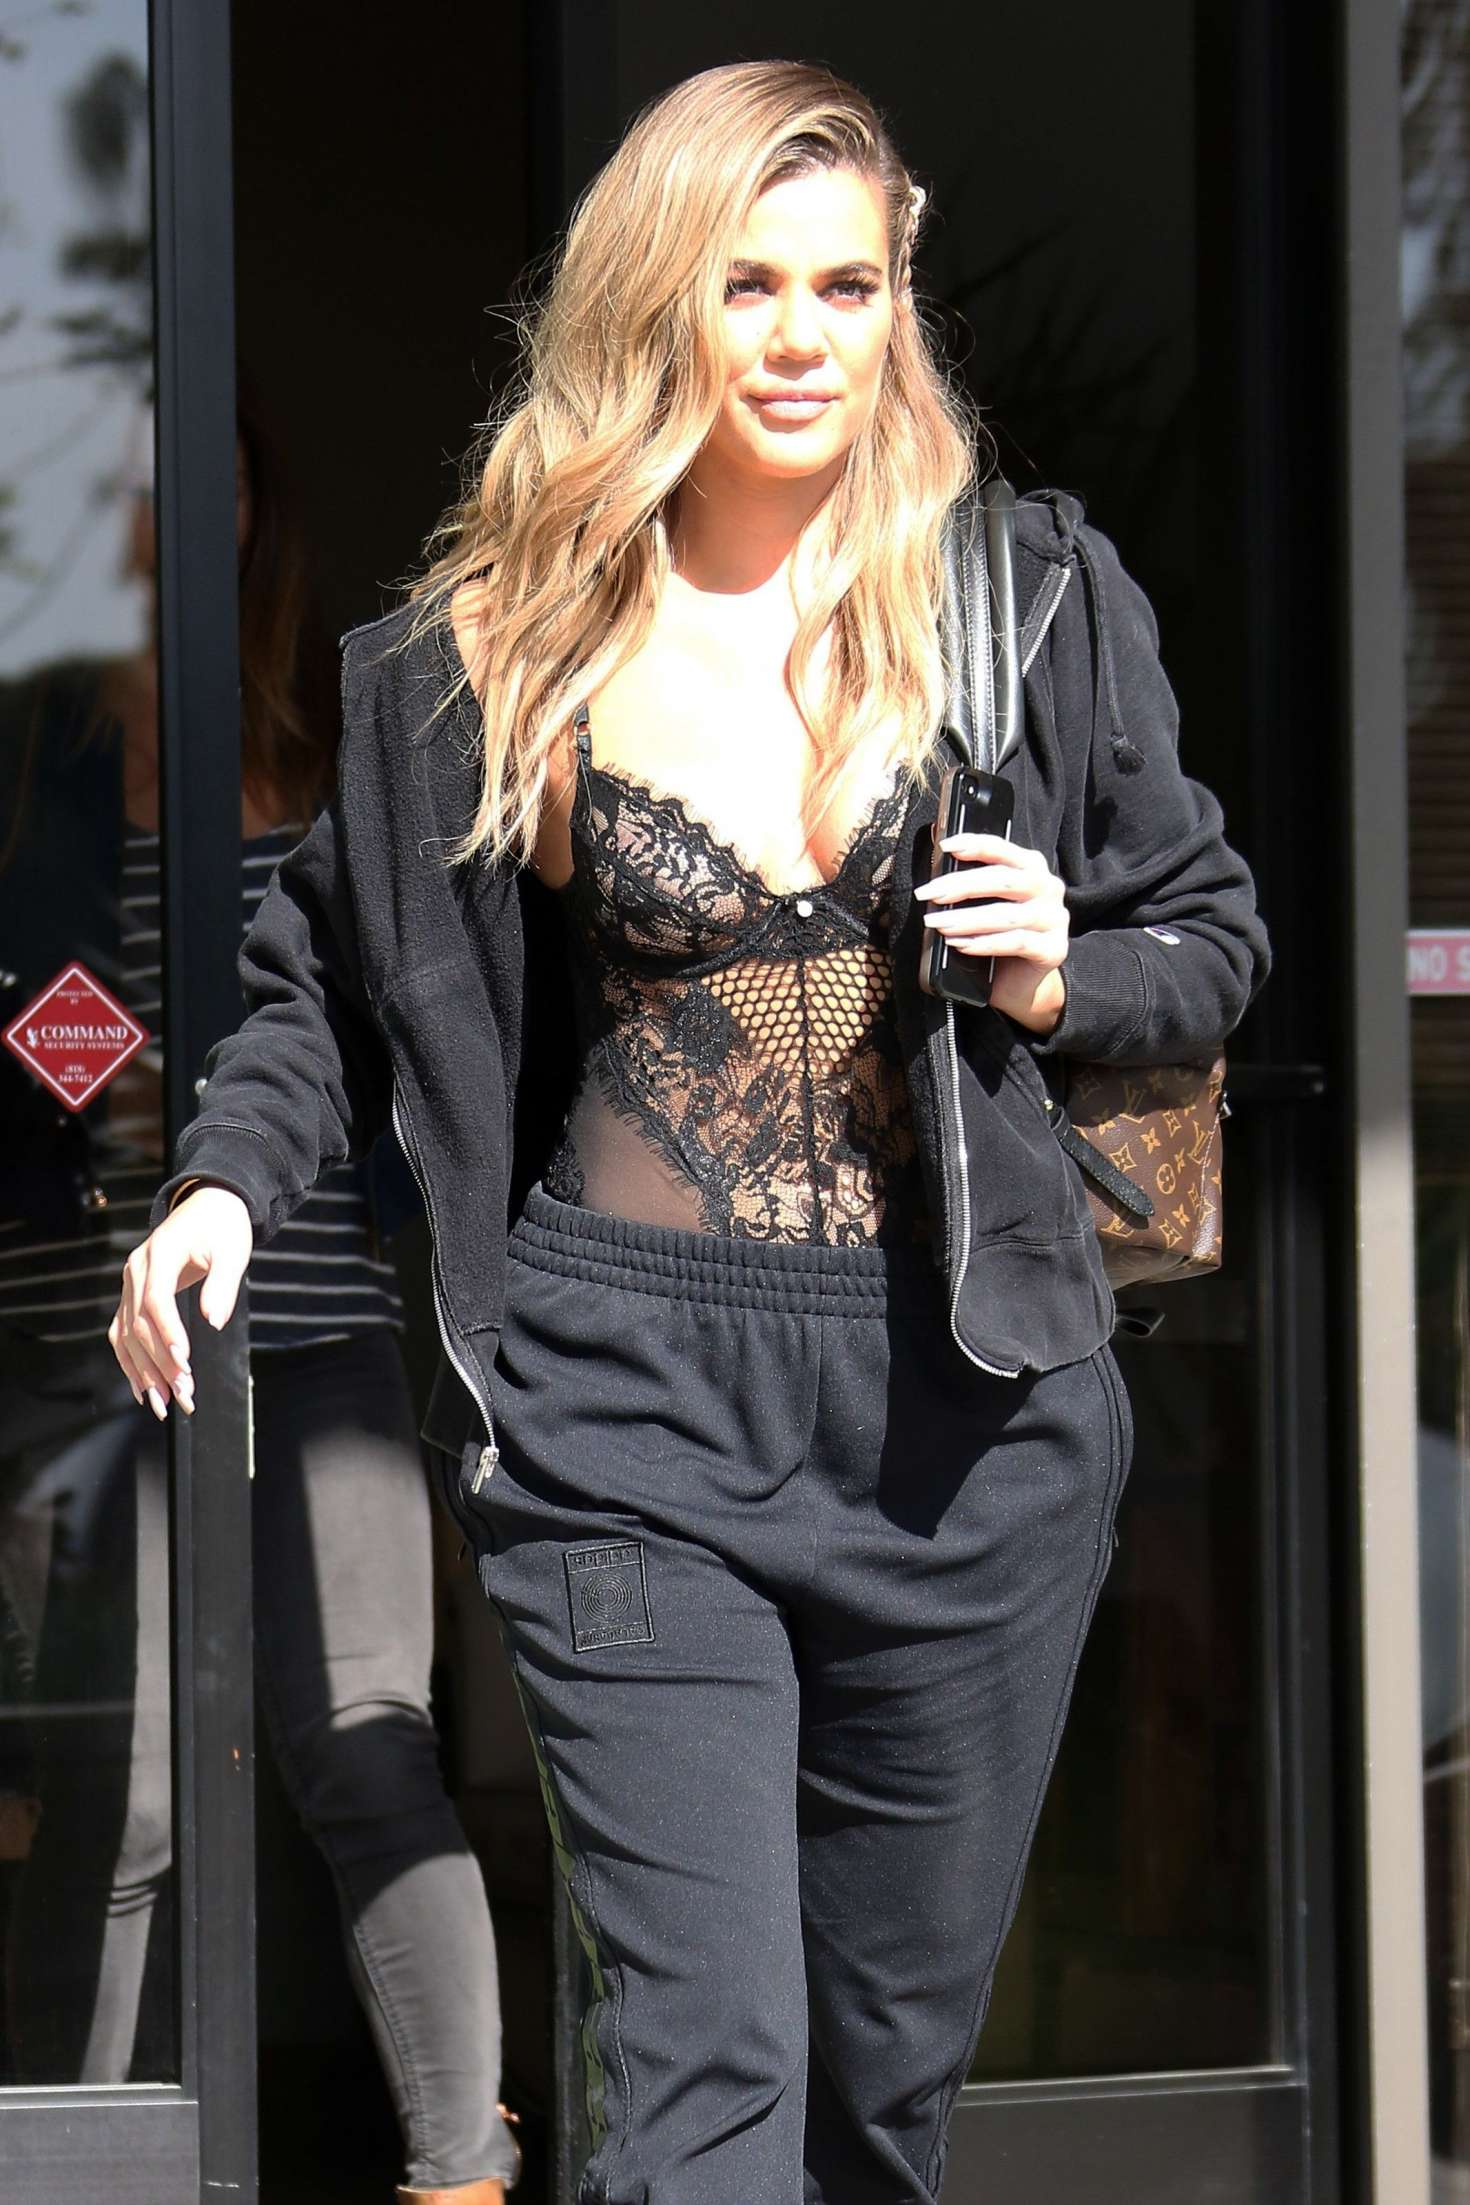 Khloe Kardashian Leaves the studio in LA